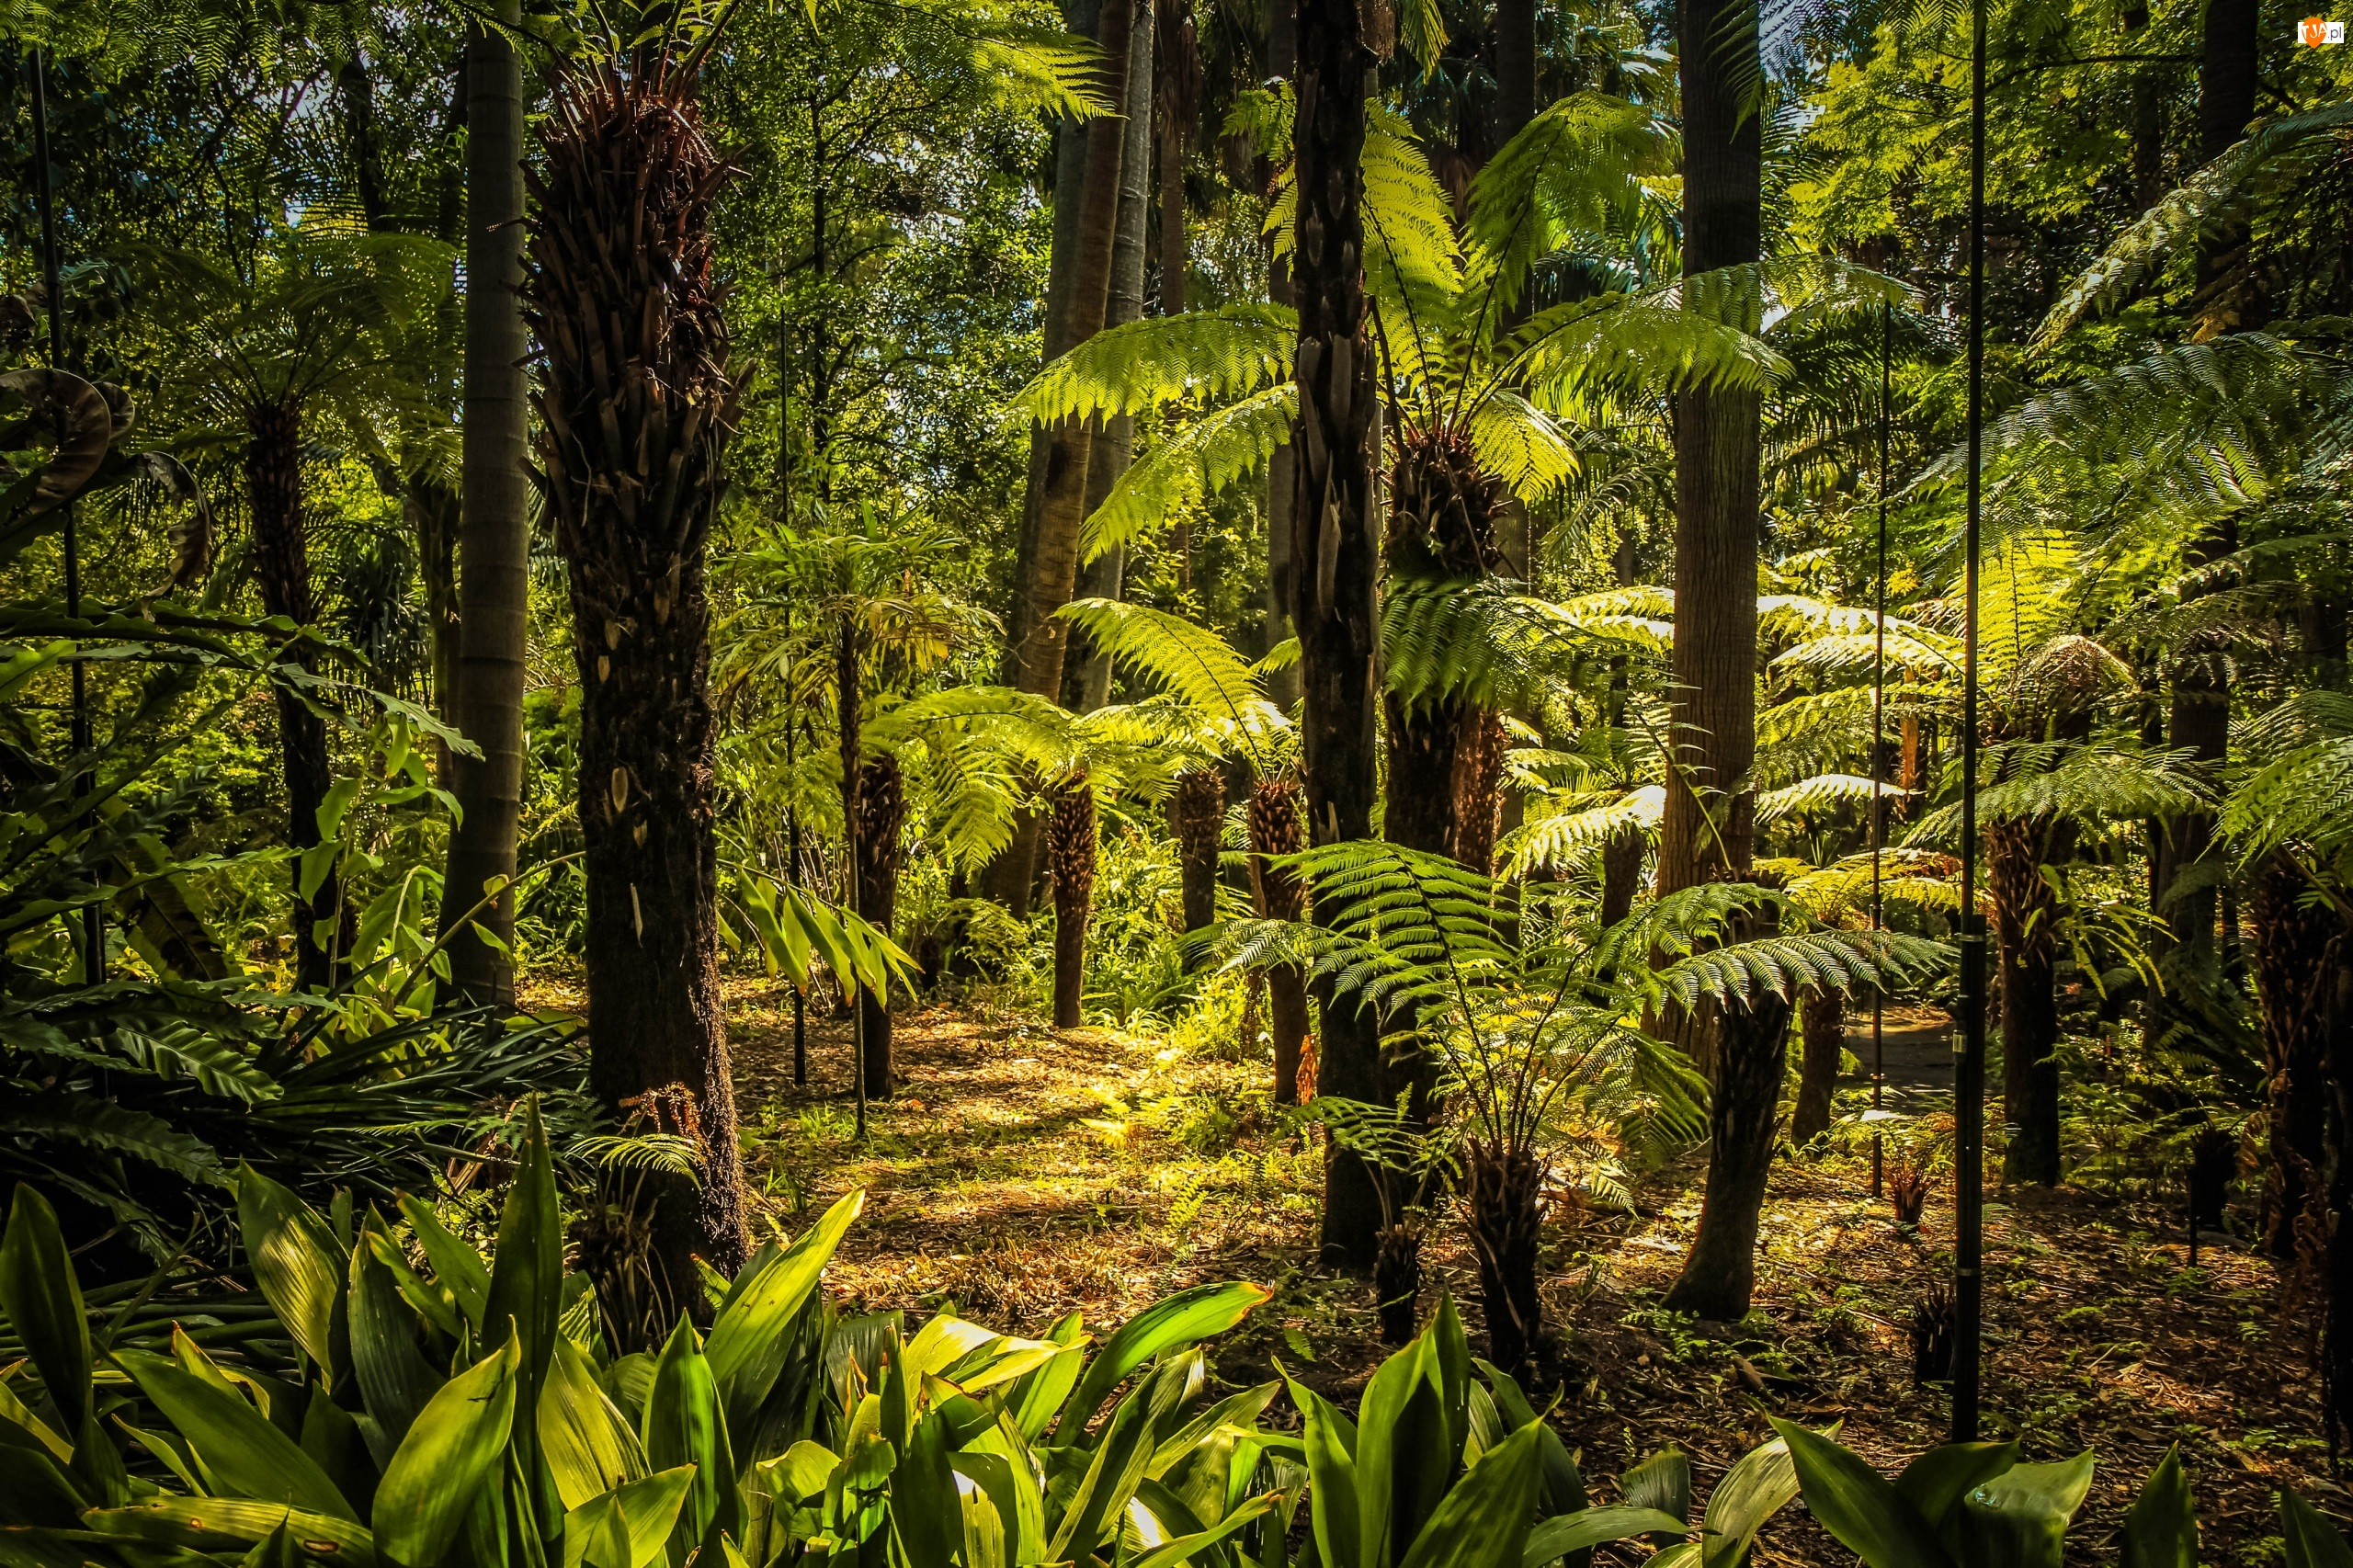 Australia, Park, Melbourne, Royal Botanic Gardens